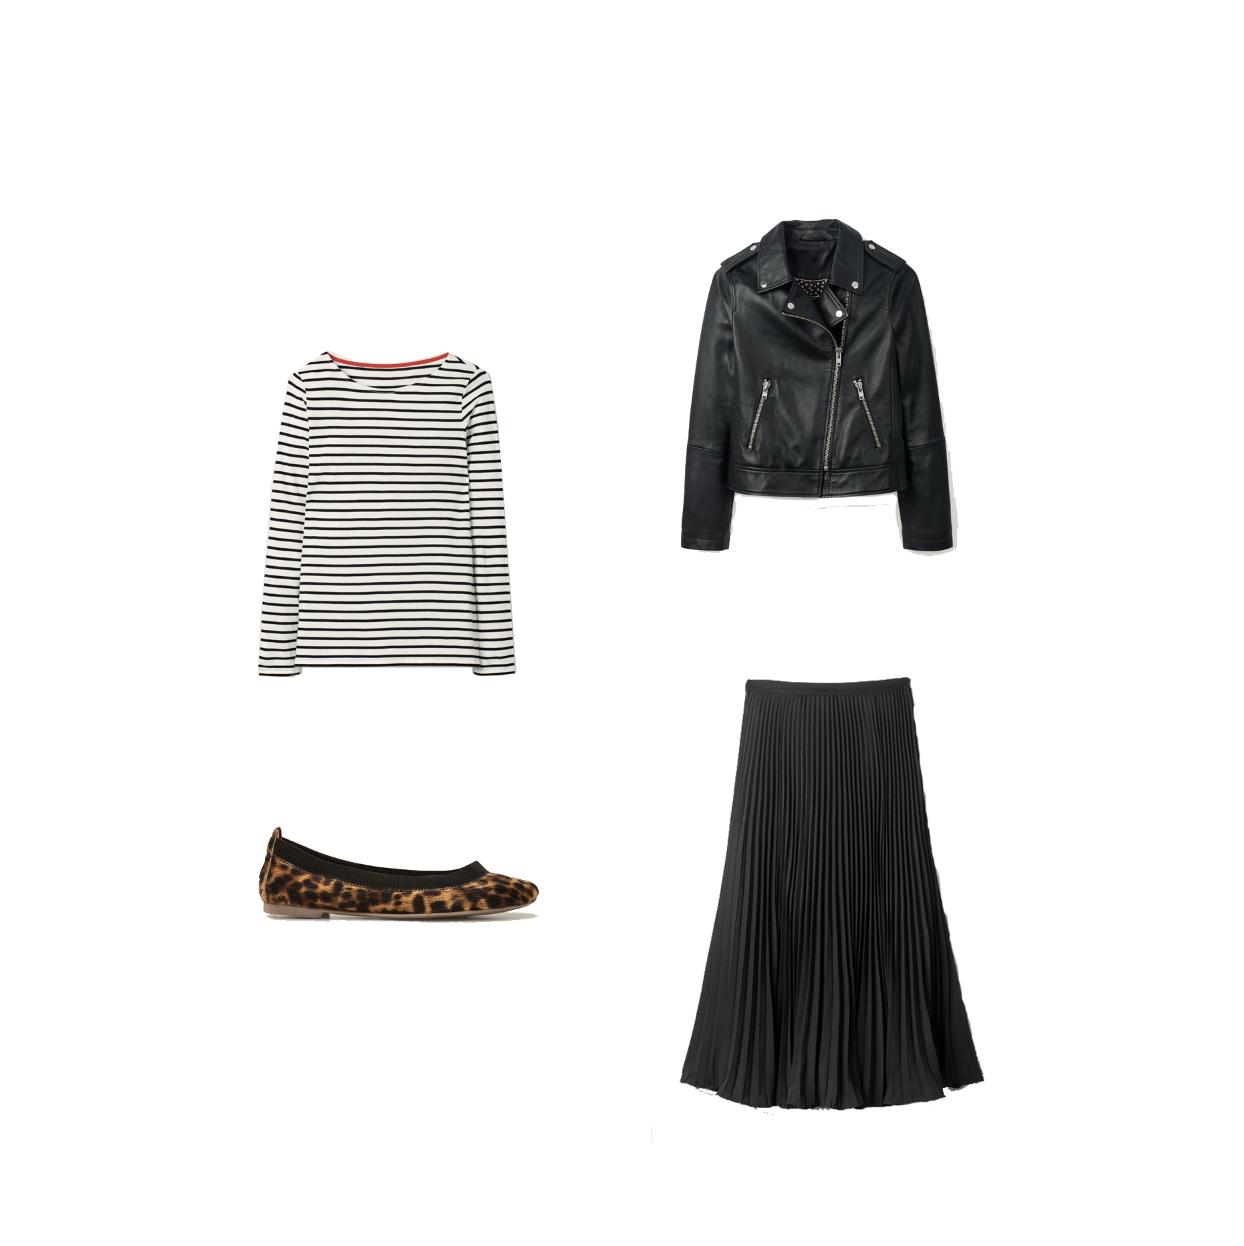 boden hetti flex ballerinas, my midlife fashion, boden leather biker jacket, boden stripe cotton breton top, boden pleated midi skirt